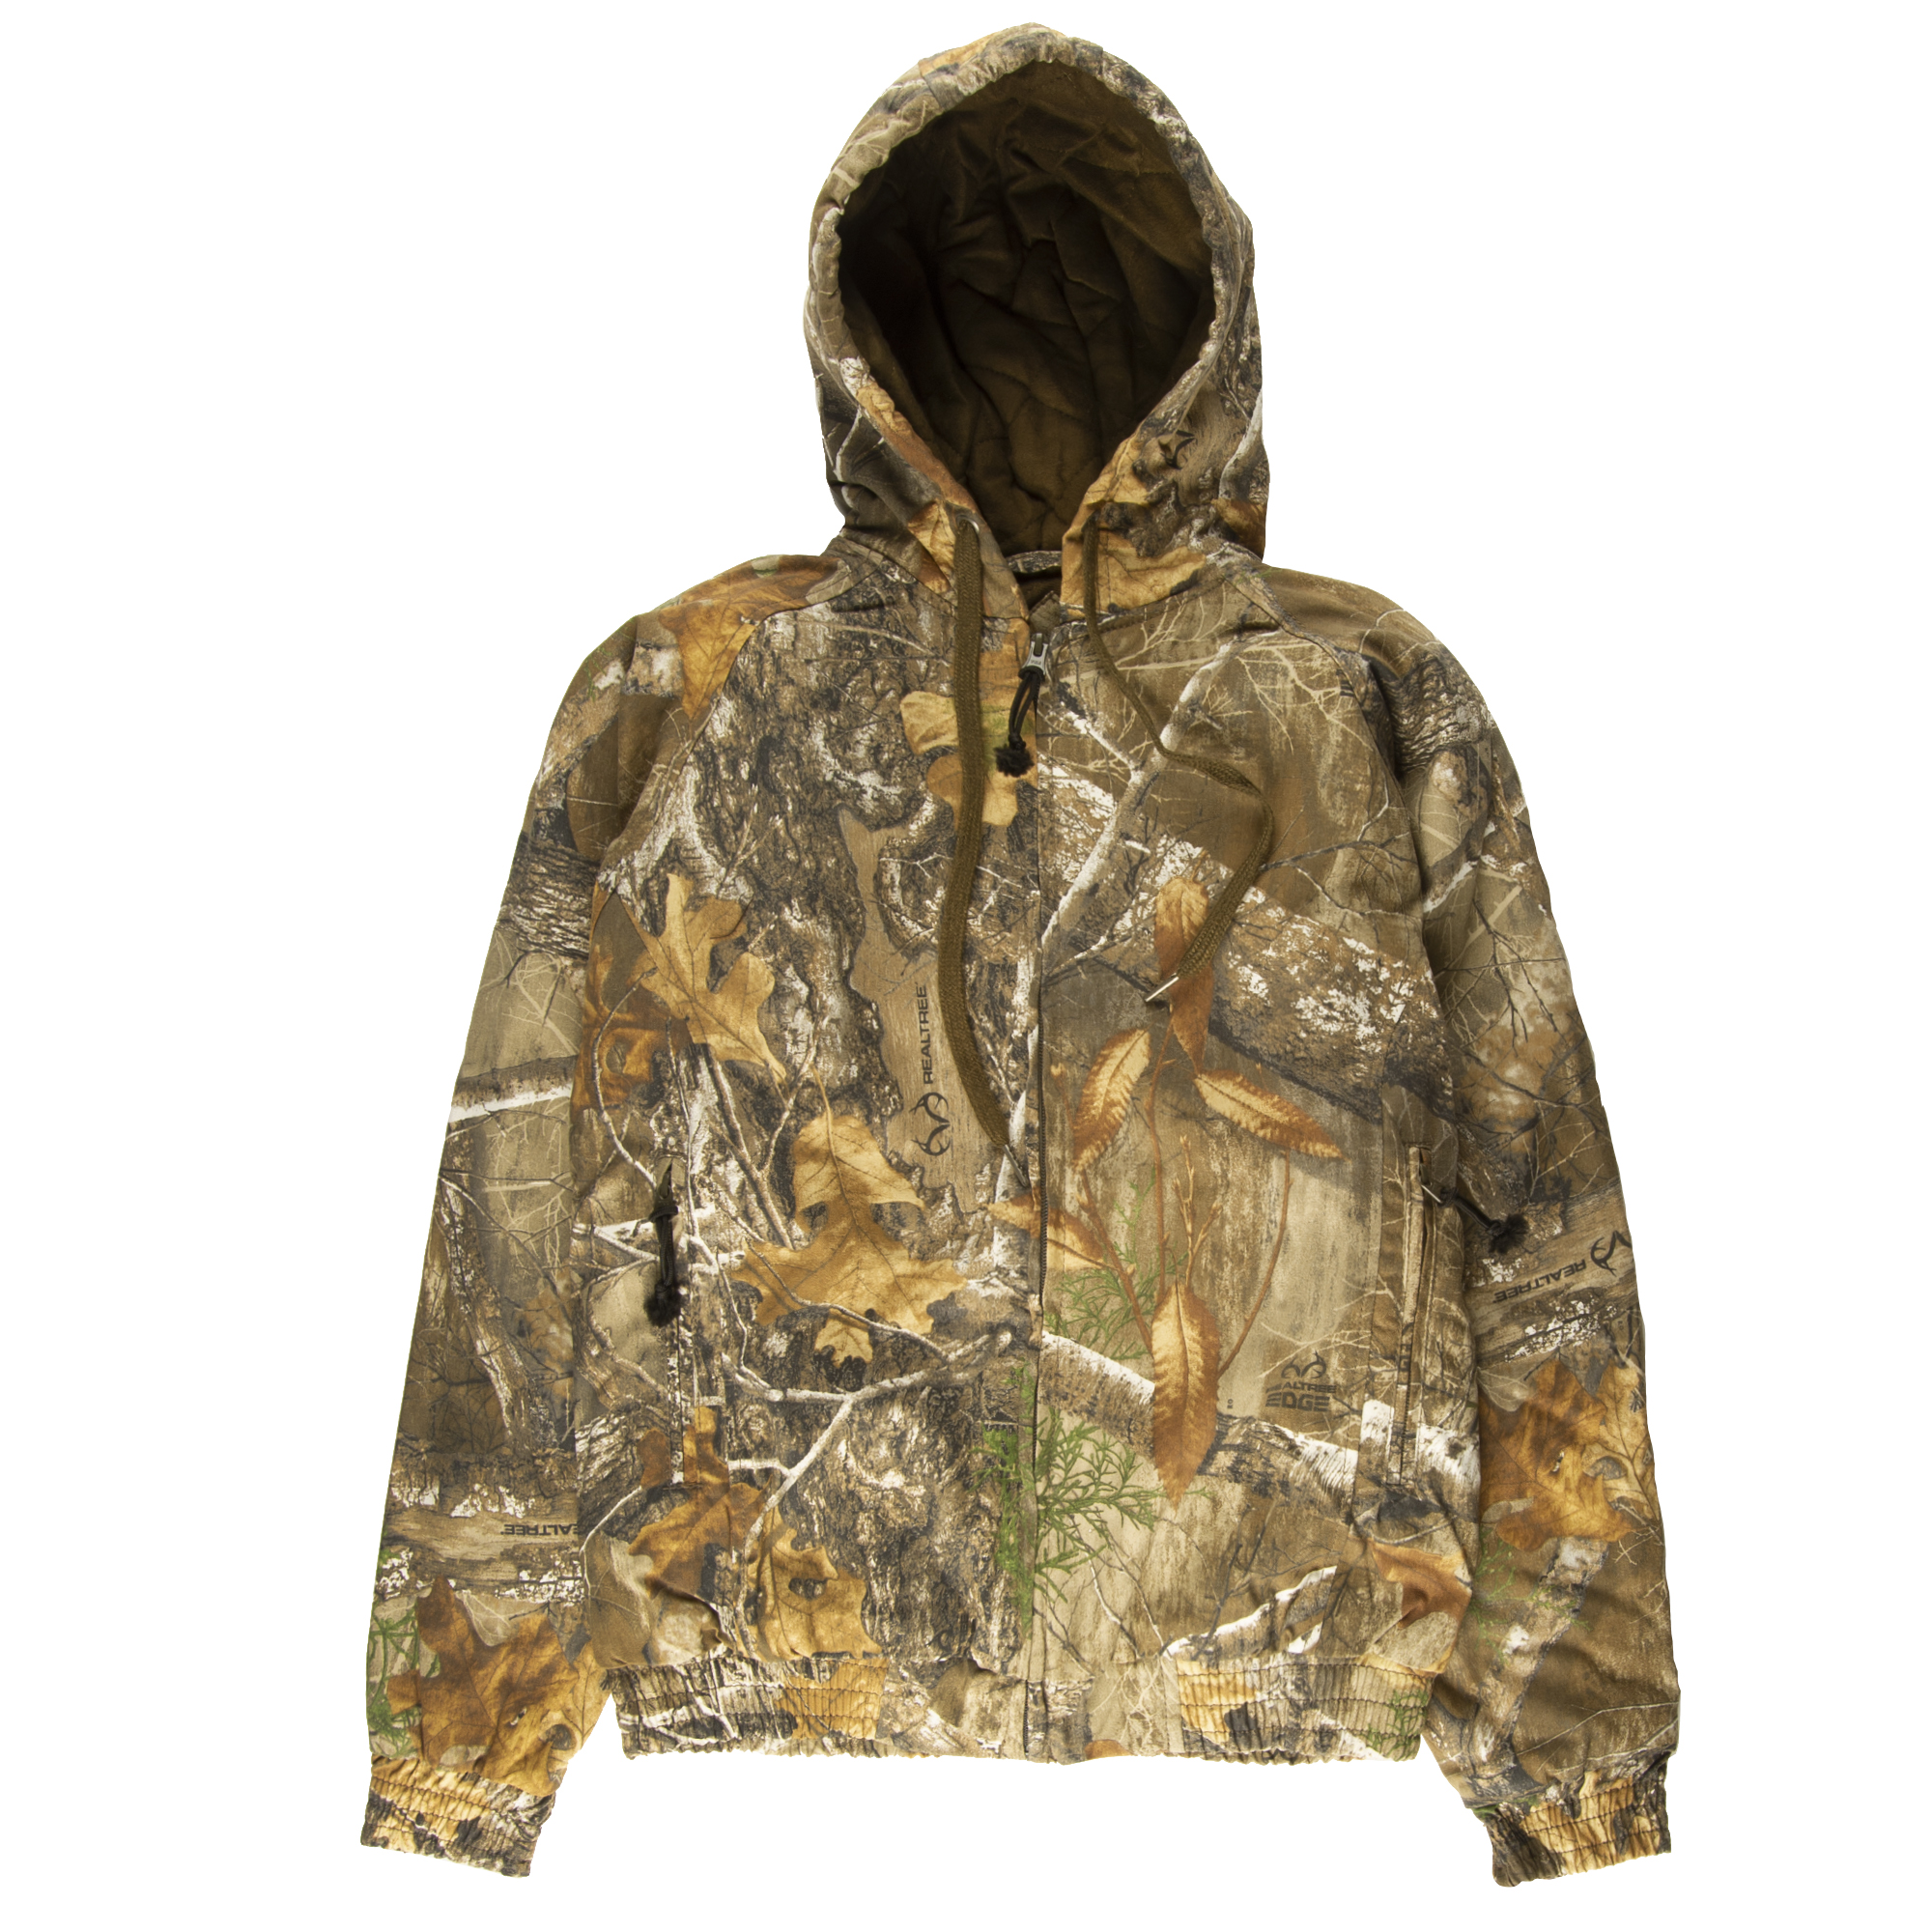 Hunter's Choice Women's Gritty Insulated Jacket, Realtree Edge Camo